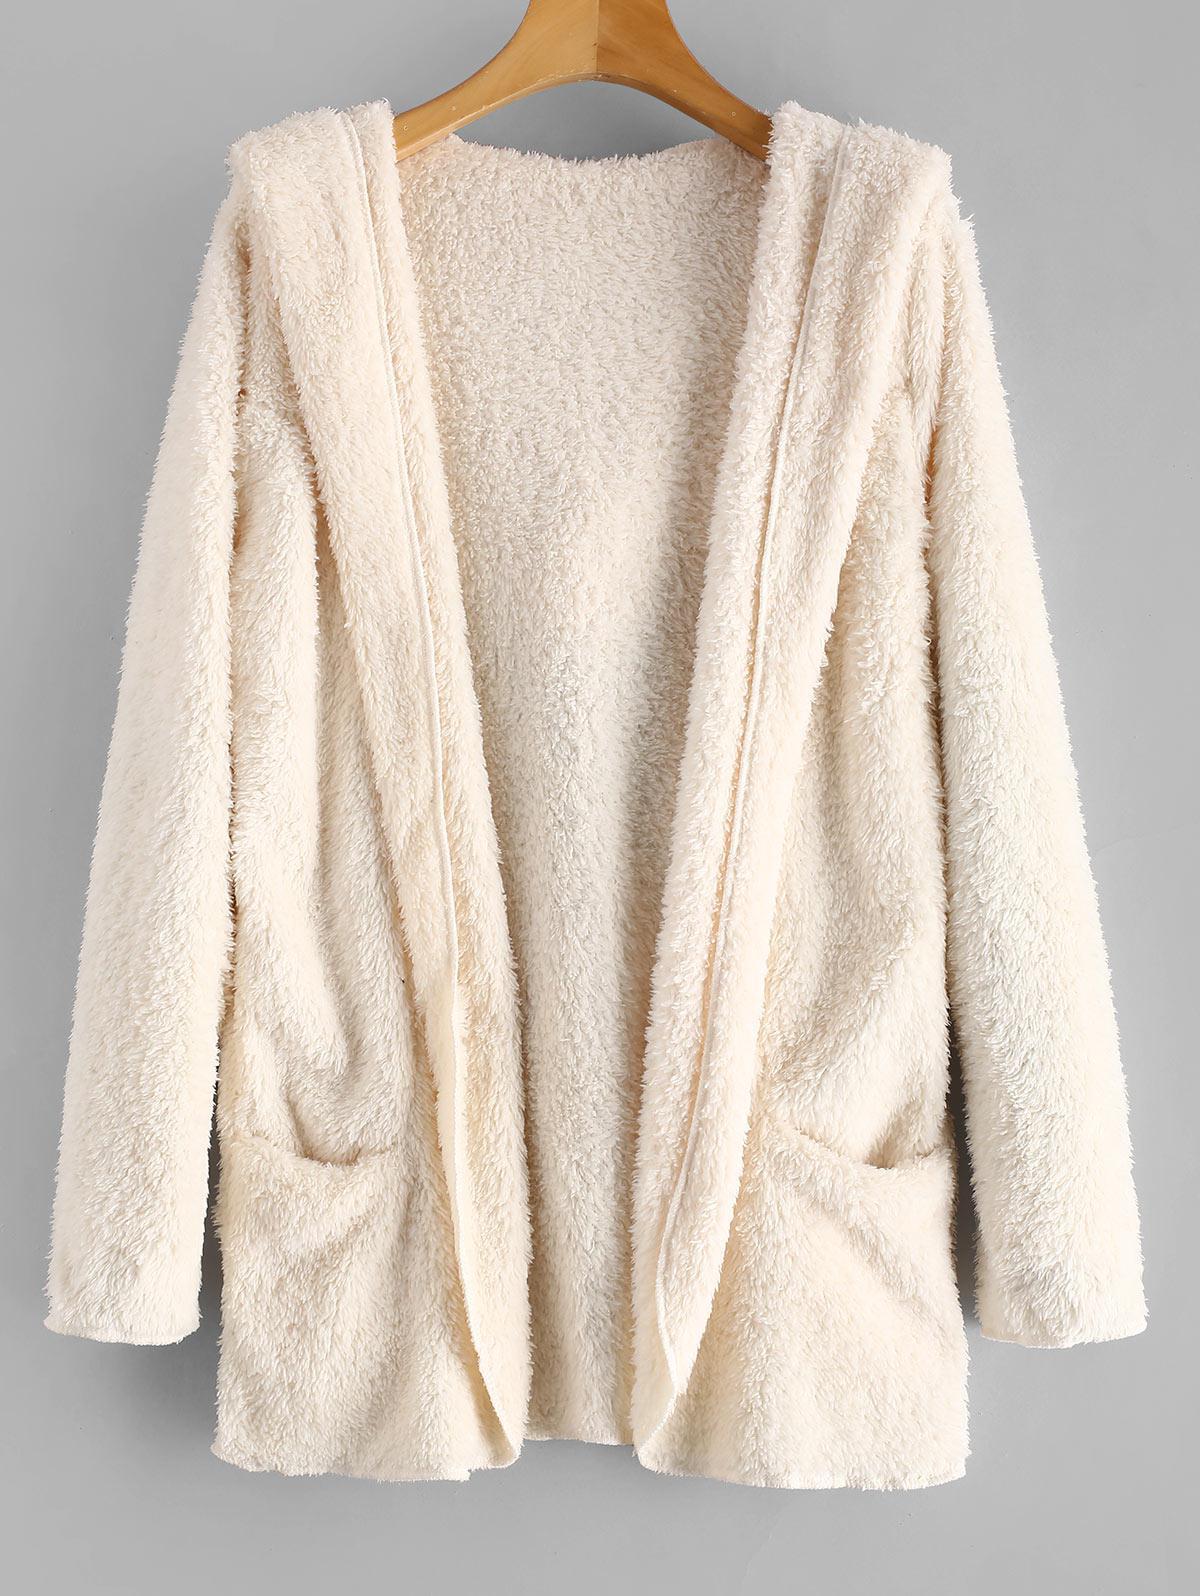 White Longline Teddy Coat Abdullah 214 Nden